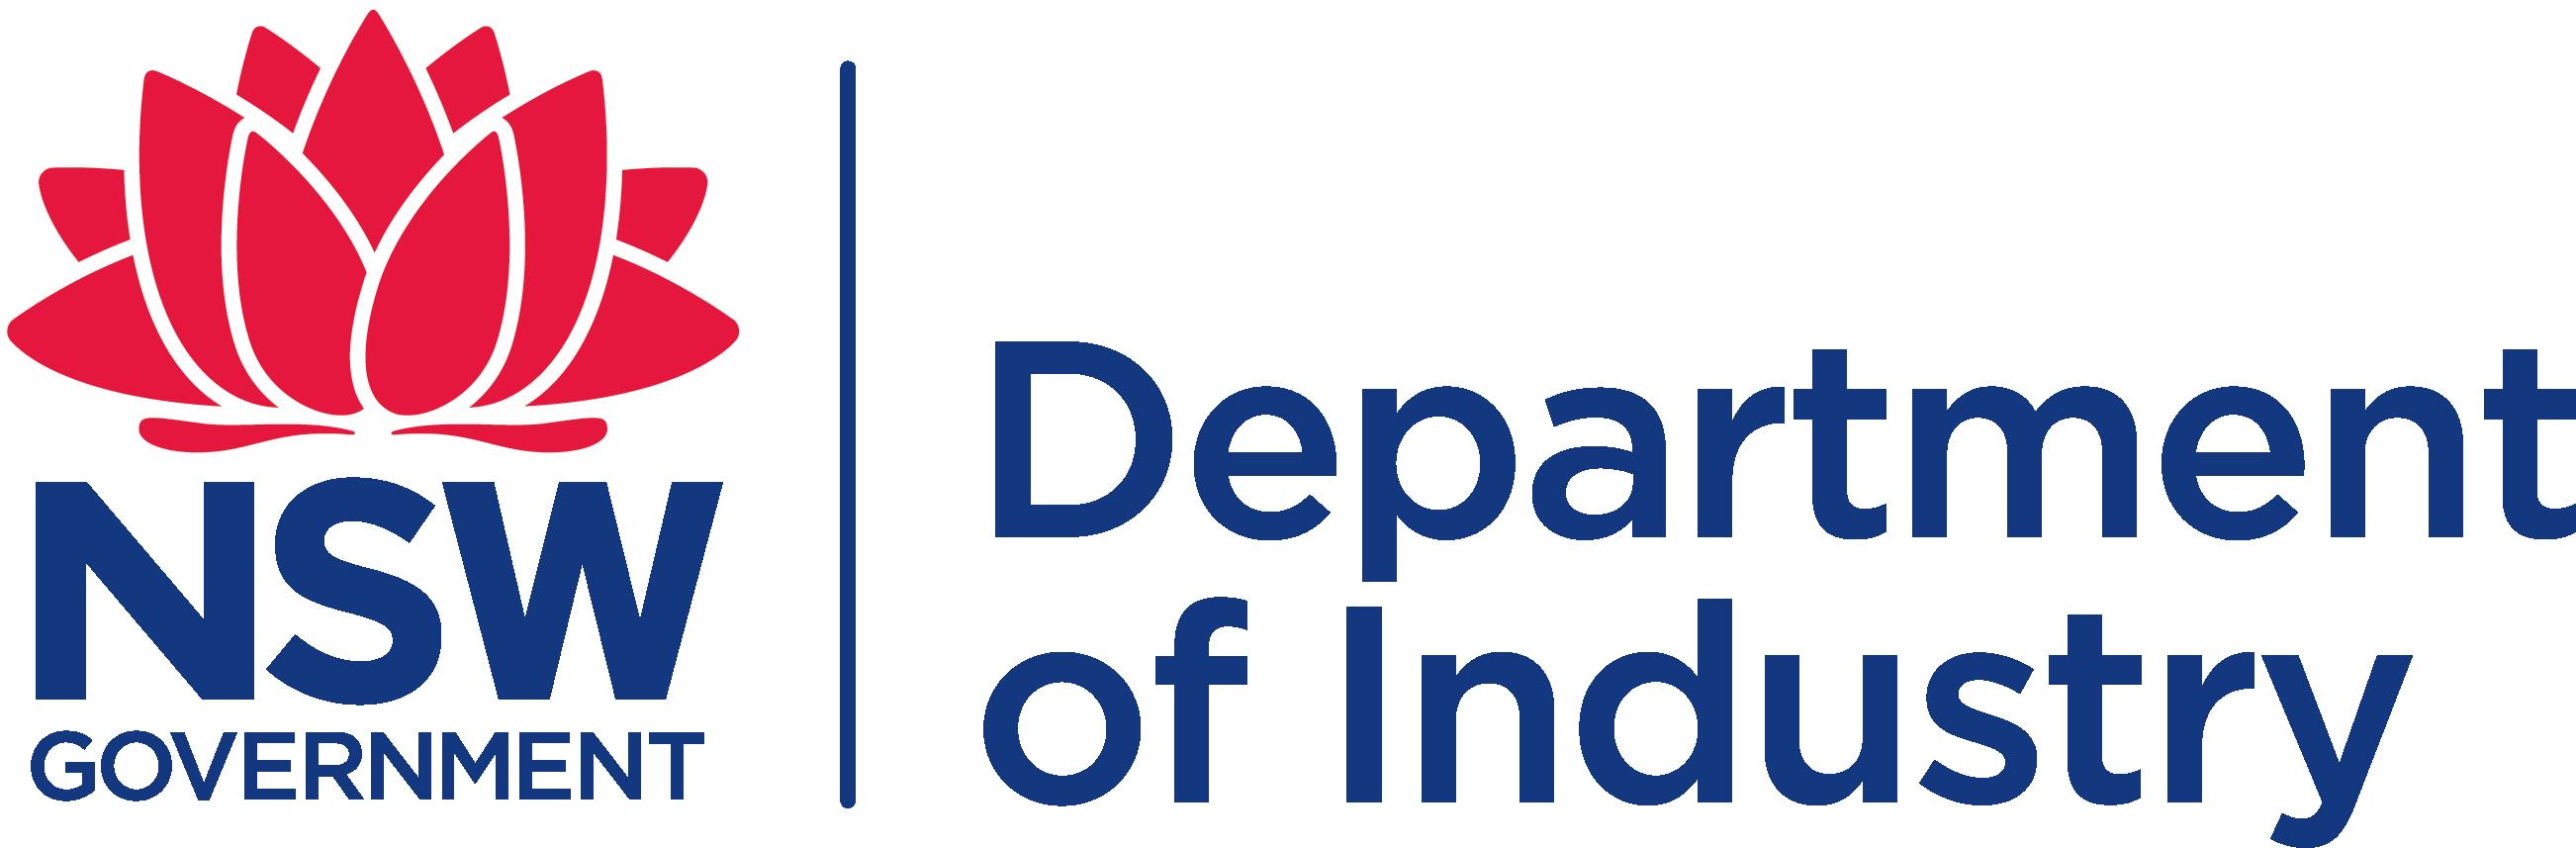 department-of-industry